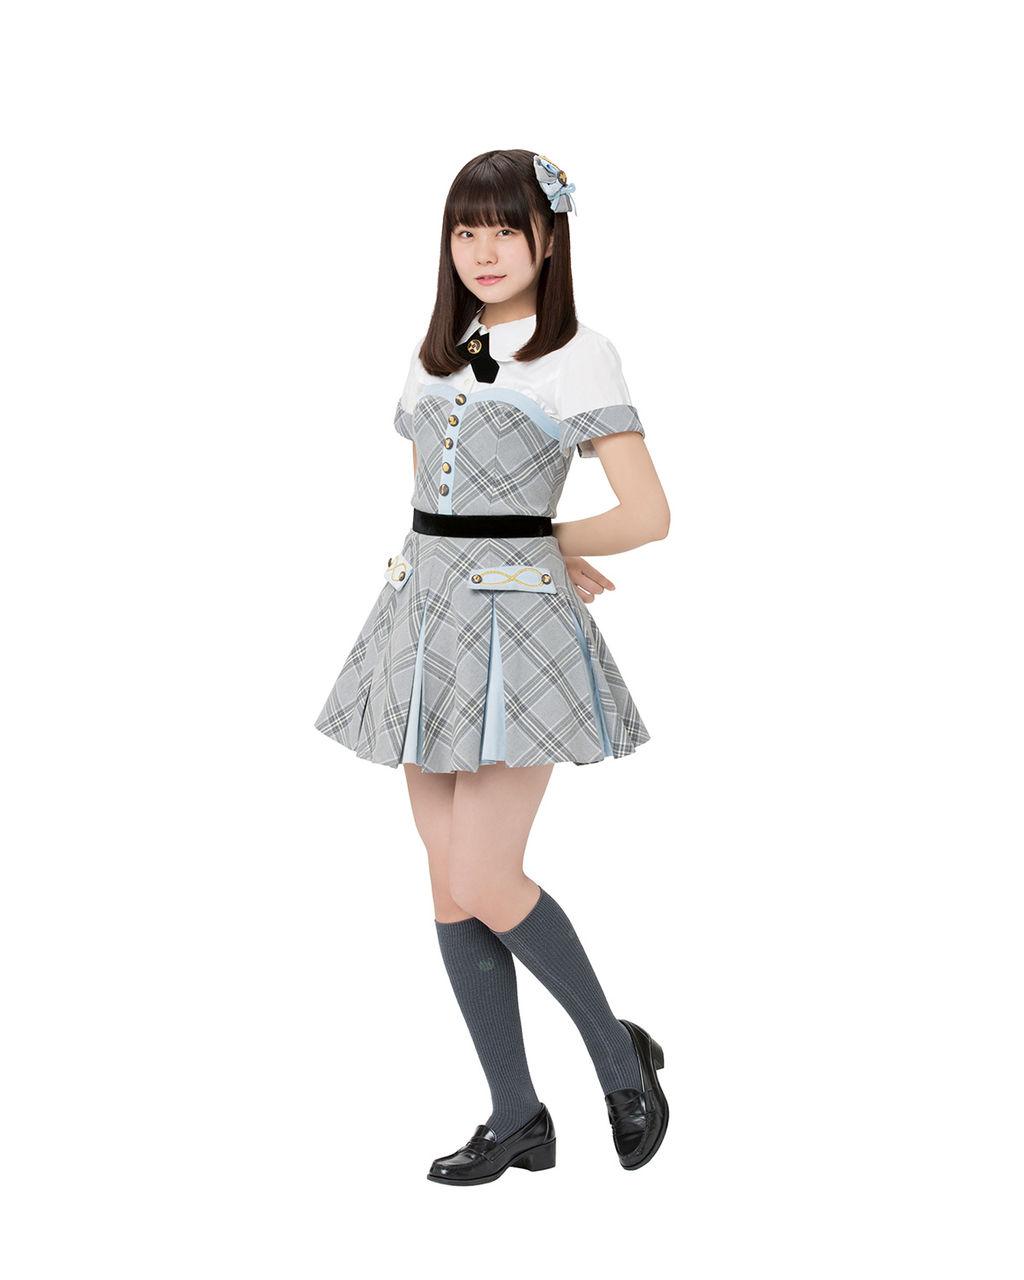 【AKB48チーム8】立仙愛理 応援スレ☆1【高知県】